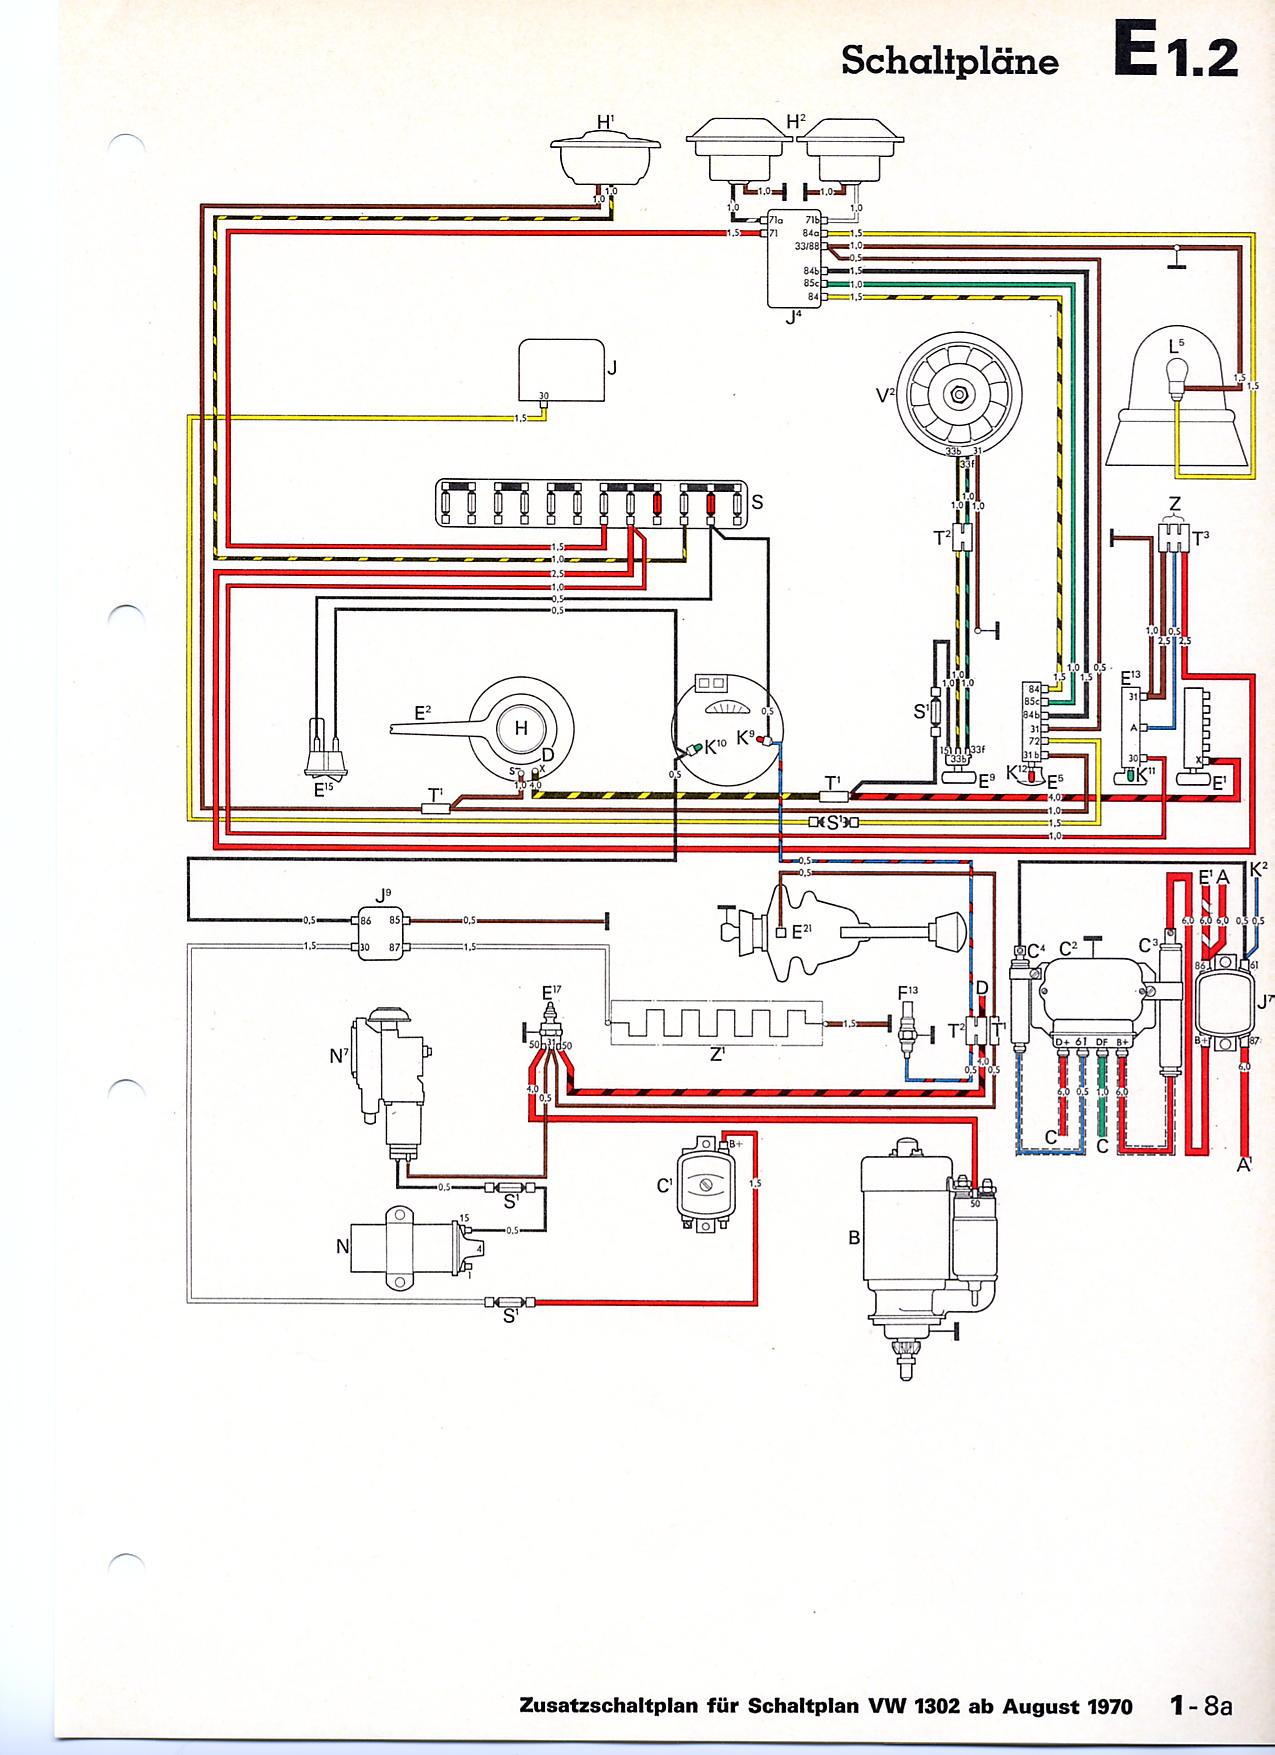 vw beetle alternator regulator wiring generator cl 8626  vw voltage regulator wiring diagram additionally 72 vw  vw voltage regulator wiring diagram